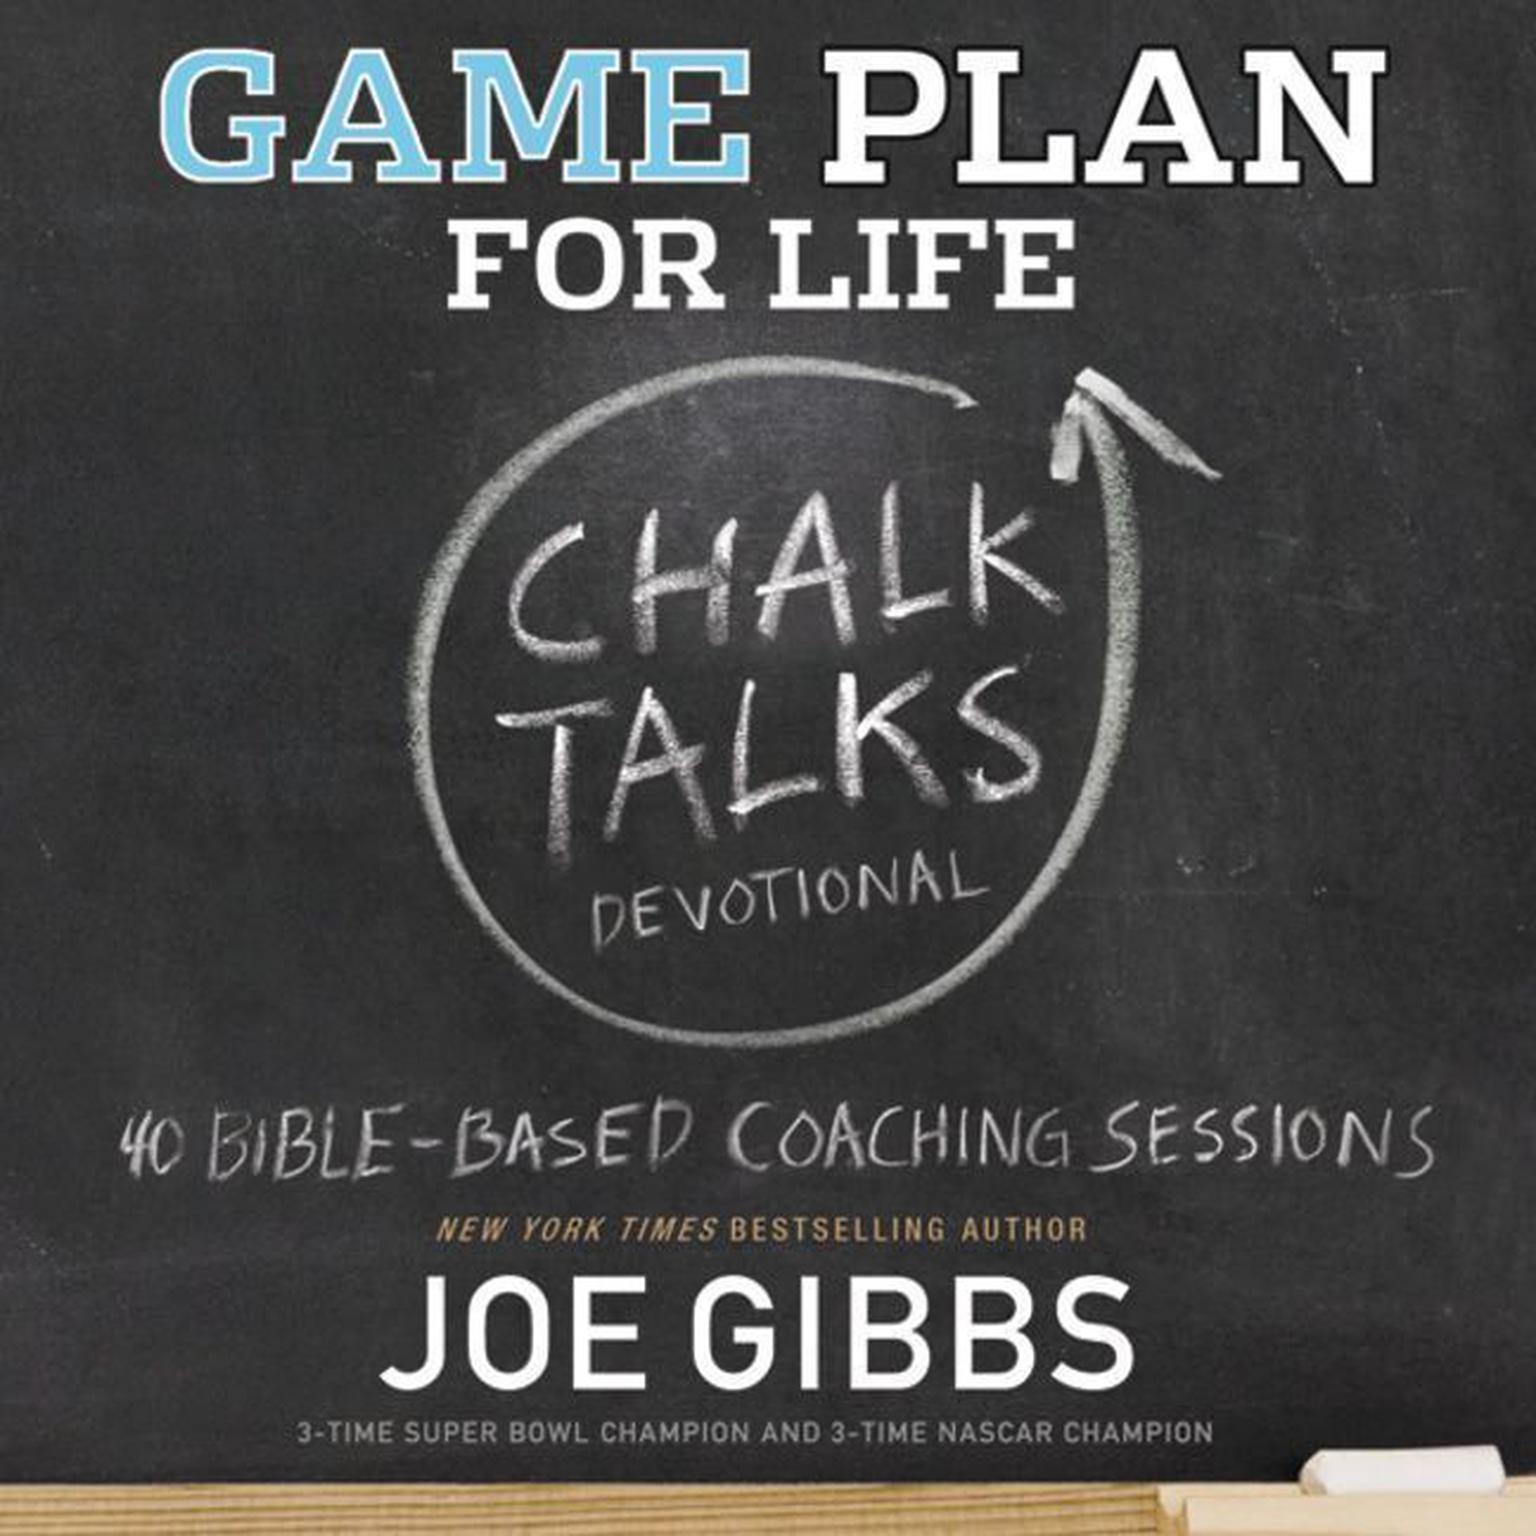 Printable Game Plan for Life CHALK TALKS: Chalk Talks Audiobook Cover Art